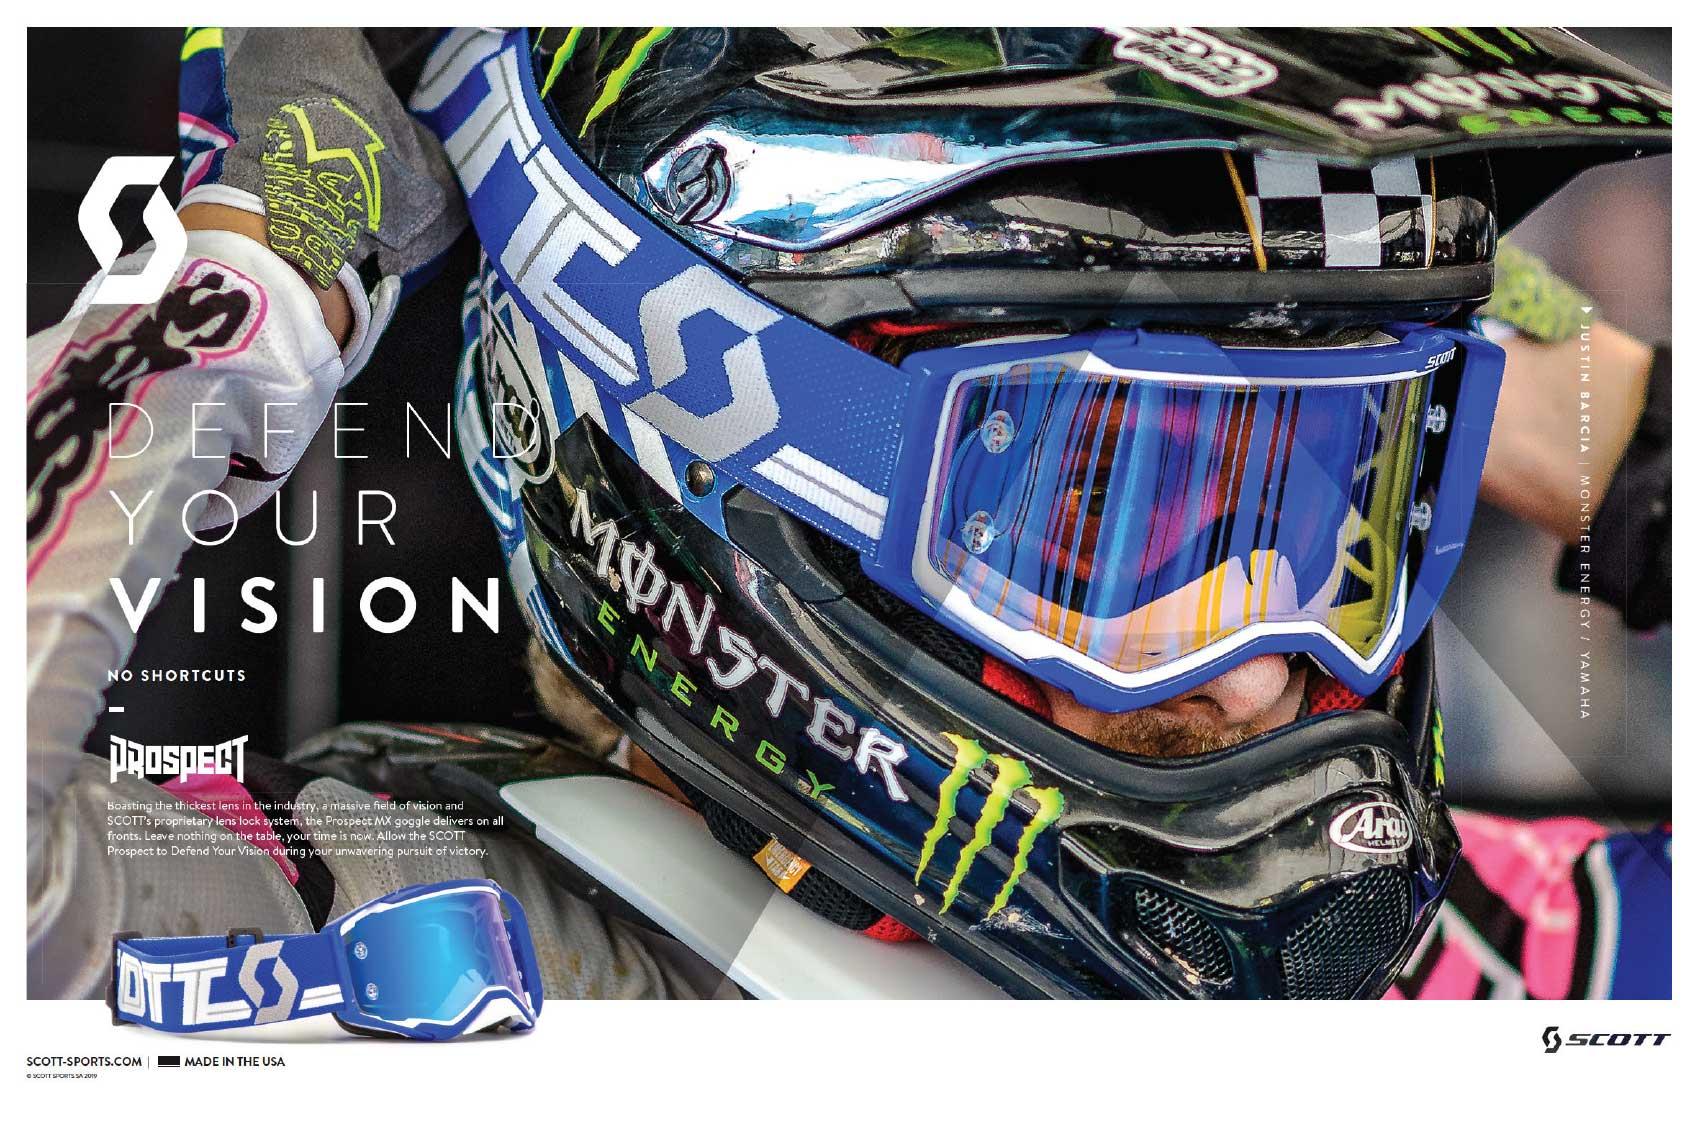 Racer X May 2019 - Scott Sports Advertisement